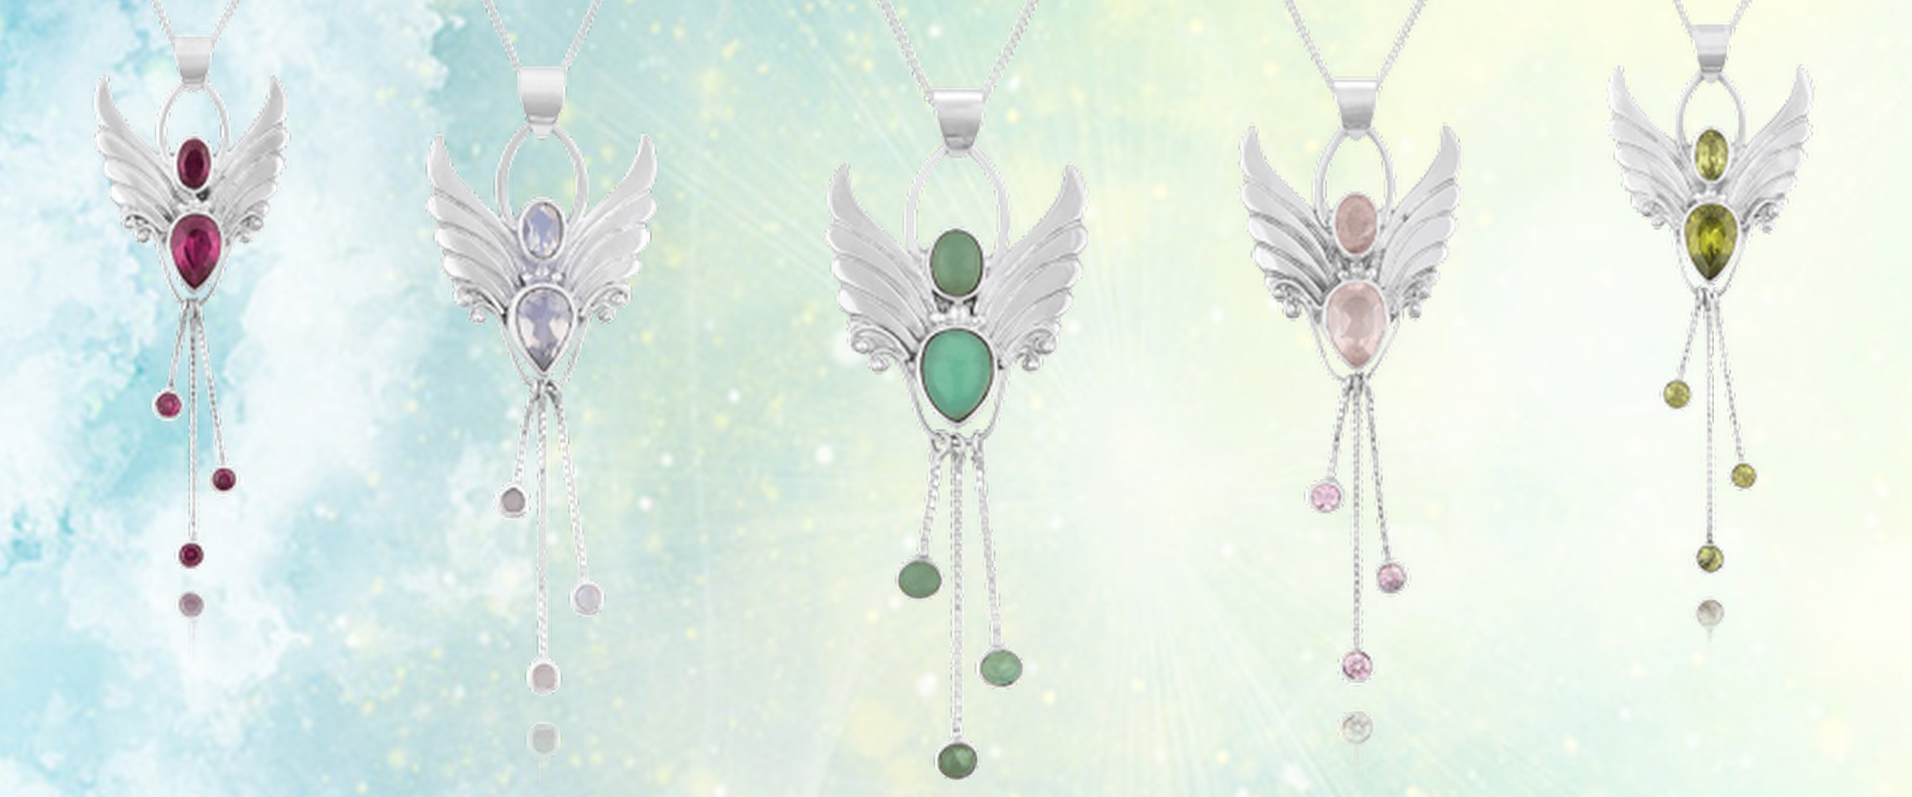 choosing your angel pendant